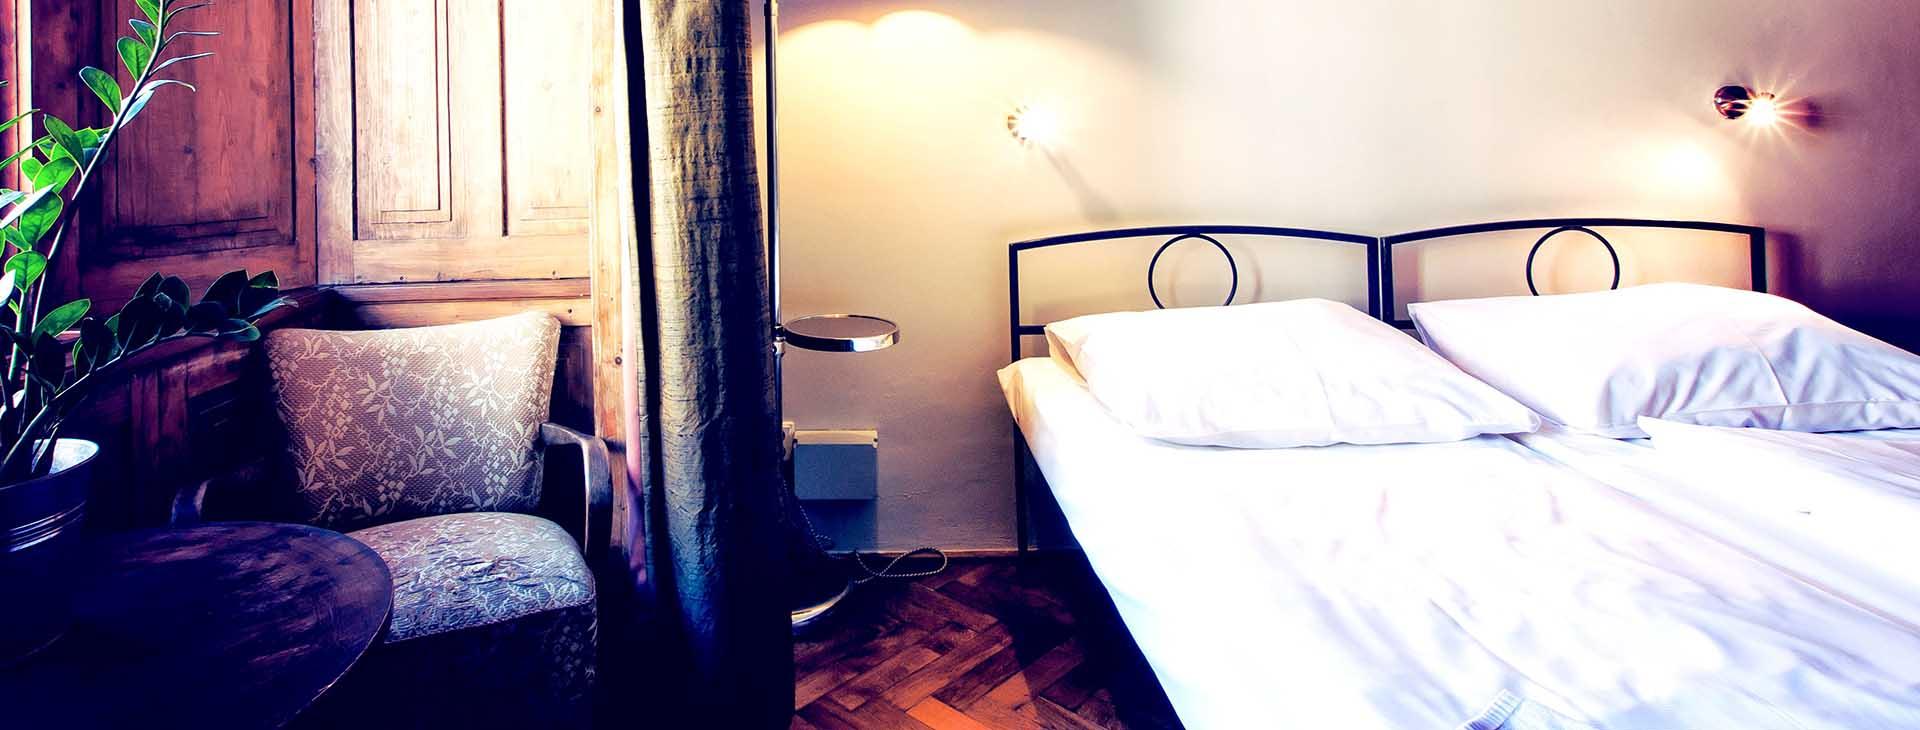 sir-tobys-hostel-prague-private-room-1920×730